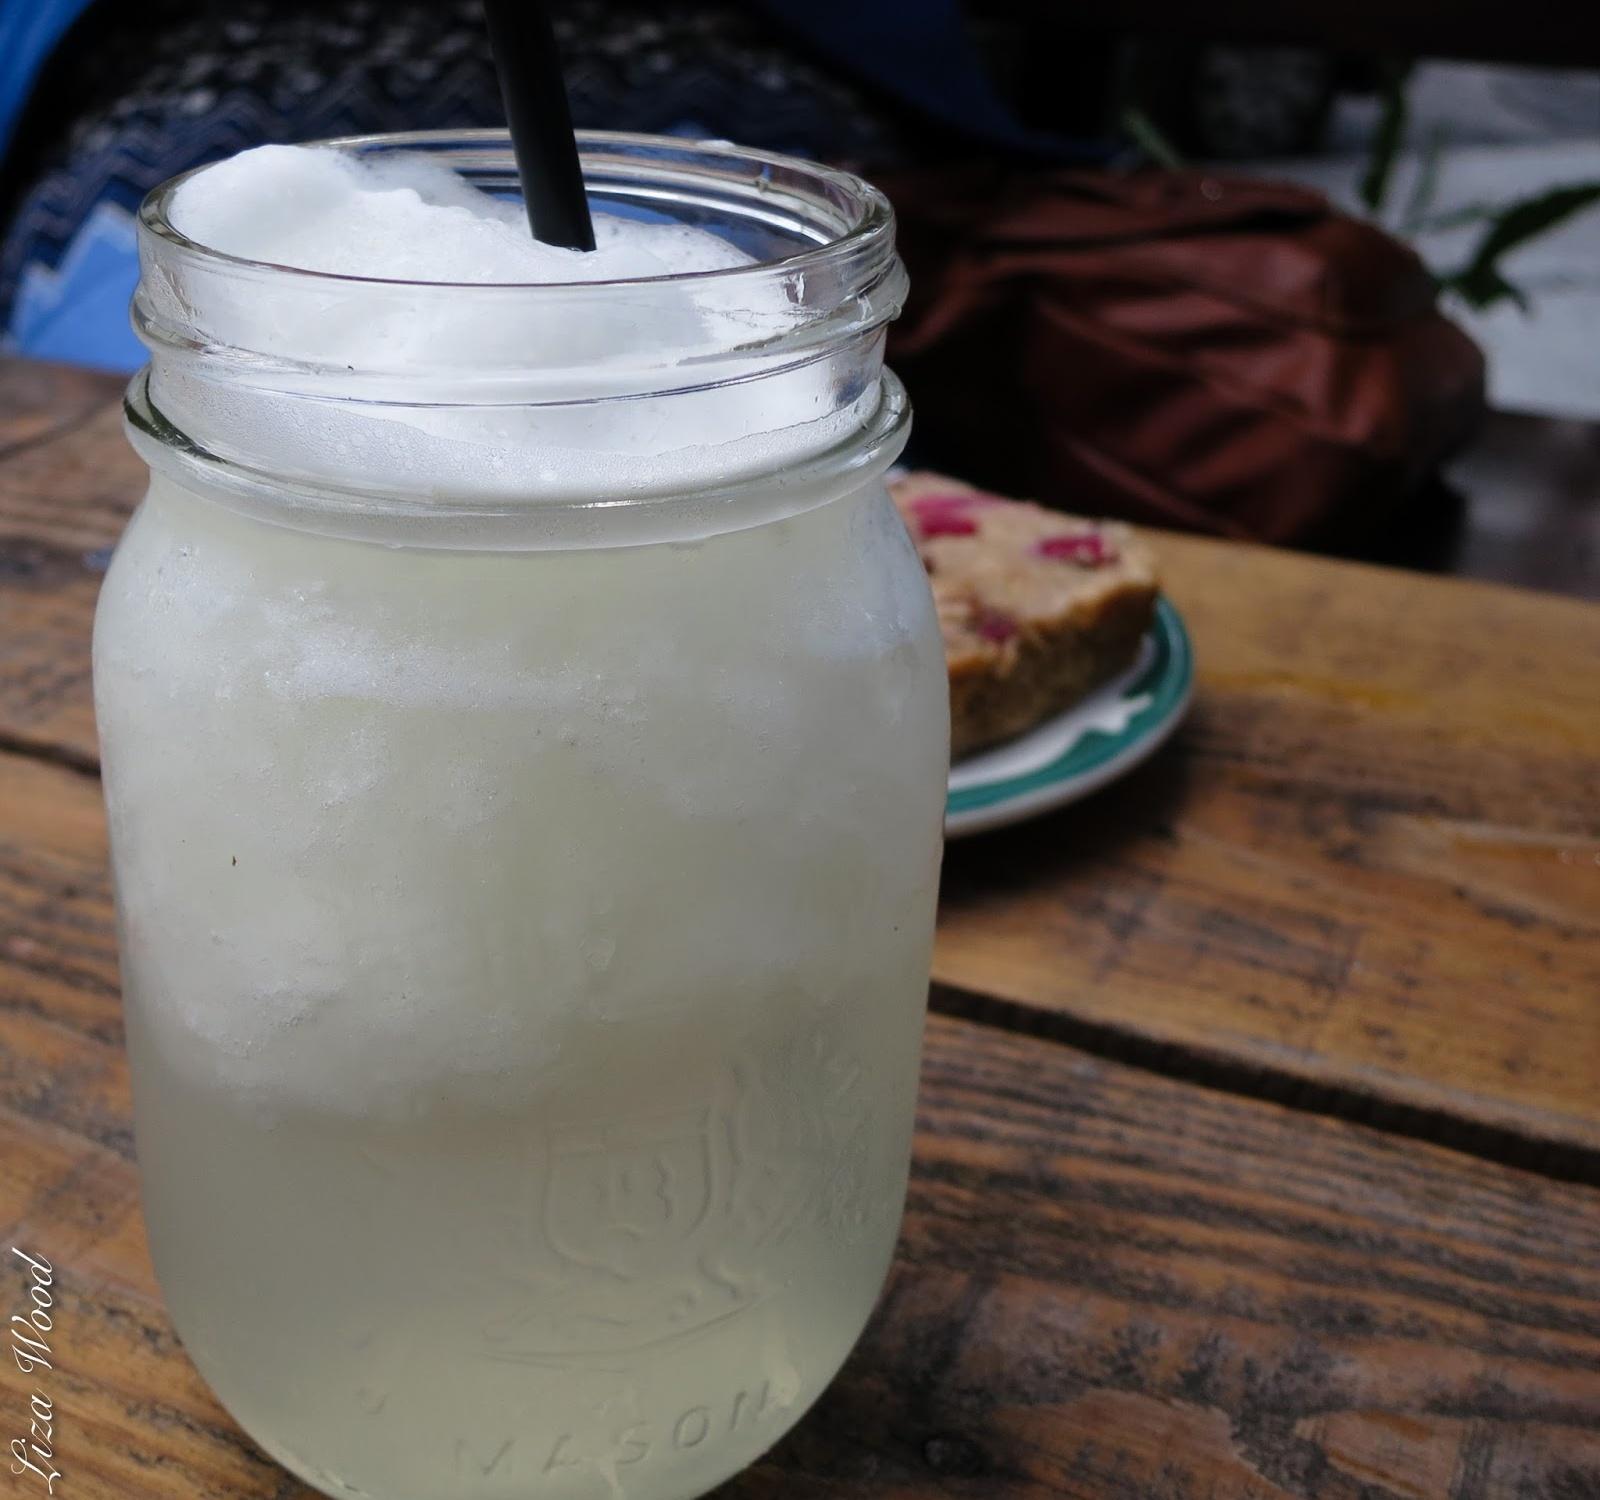 Lemonade mason jar on wooden table